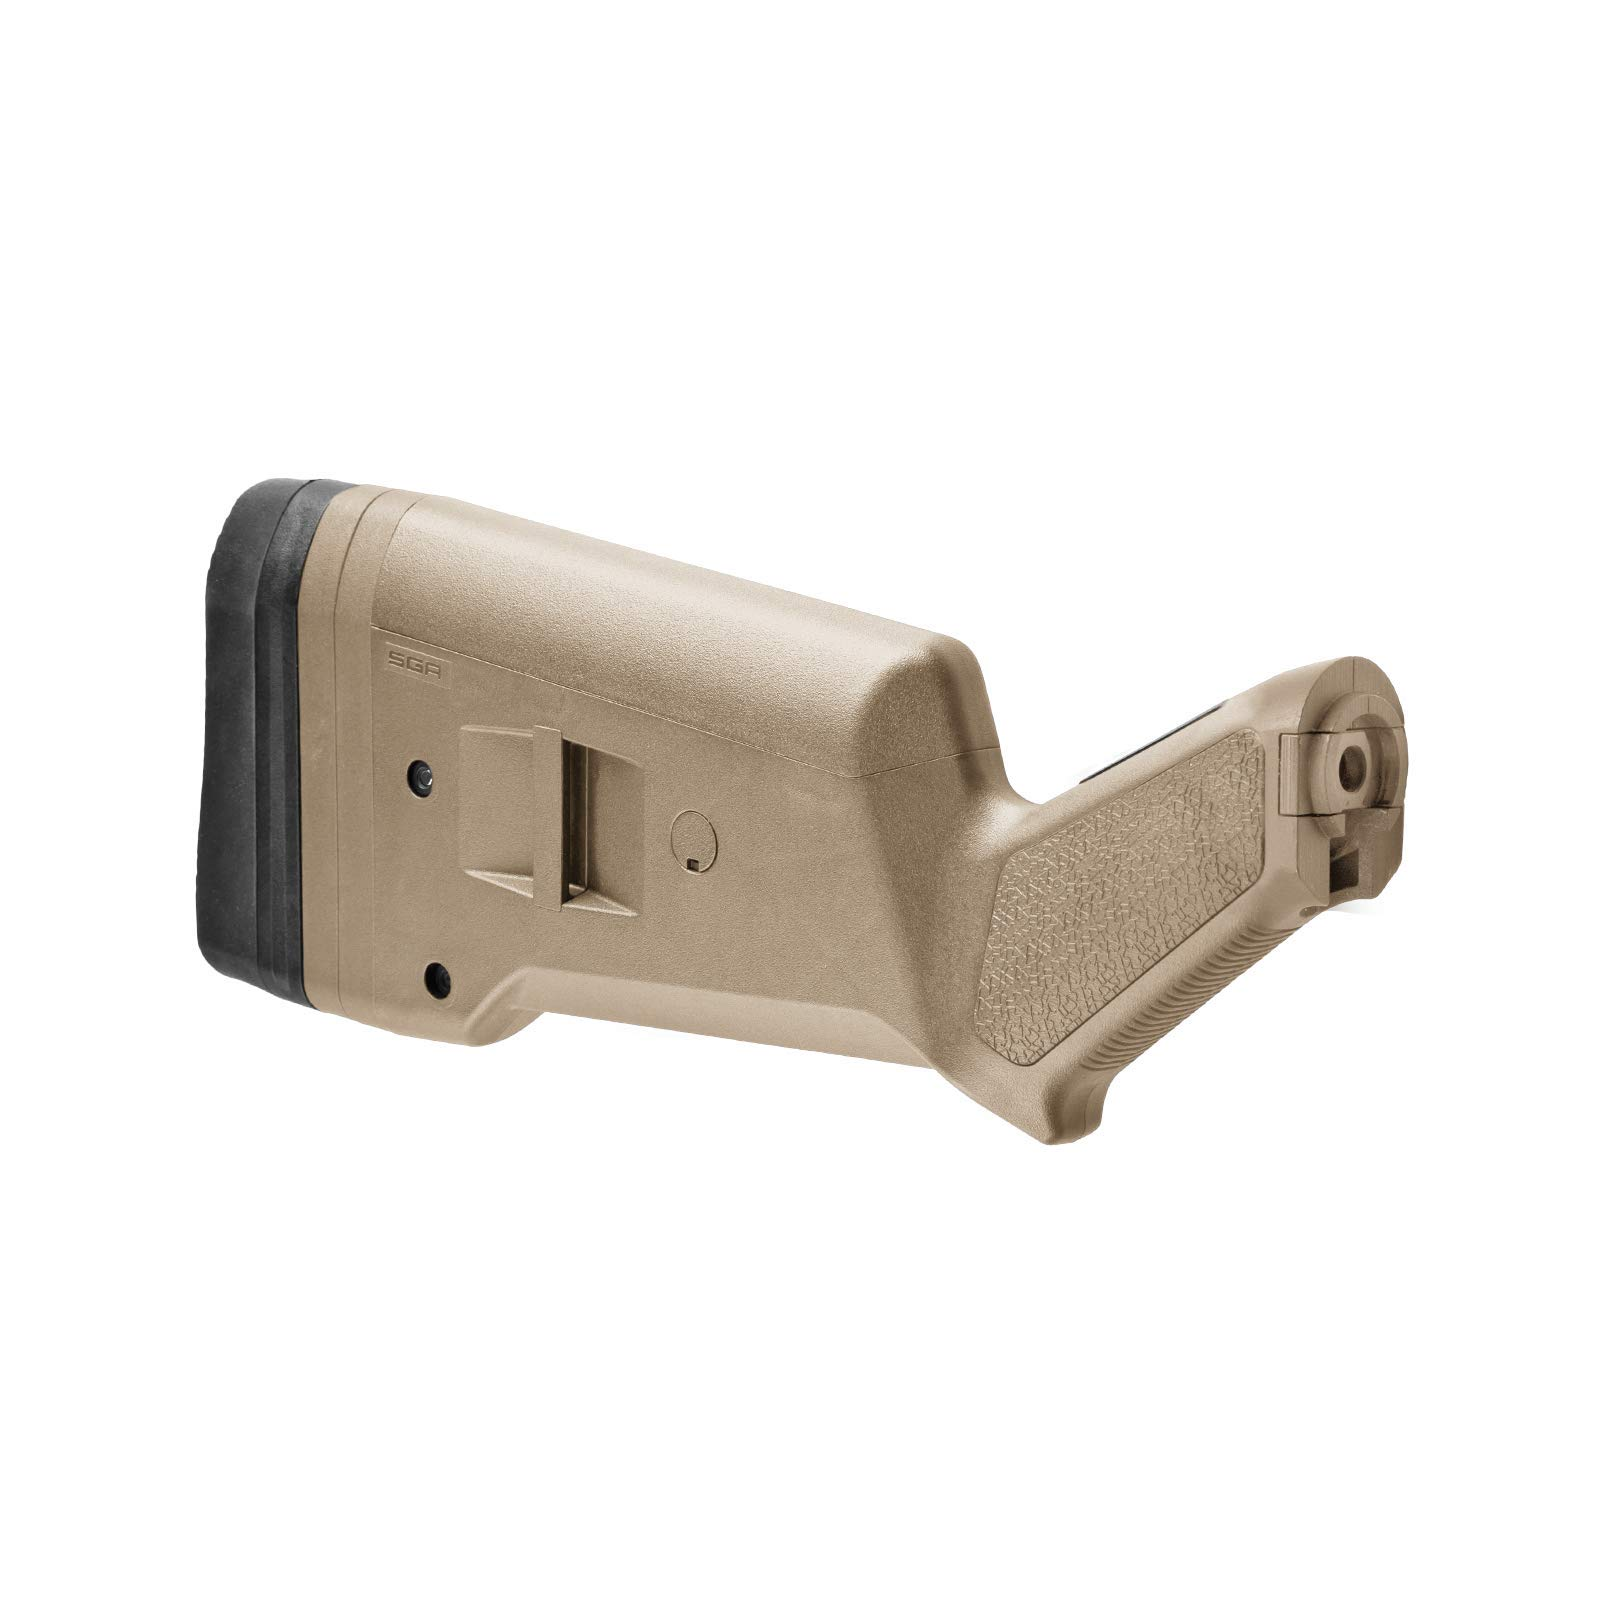 Magpul SGA Ambidextrous Butt Stock Mossberg 500/590/590A1 Shotgun, Flat Dark Earth by Magpul